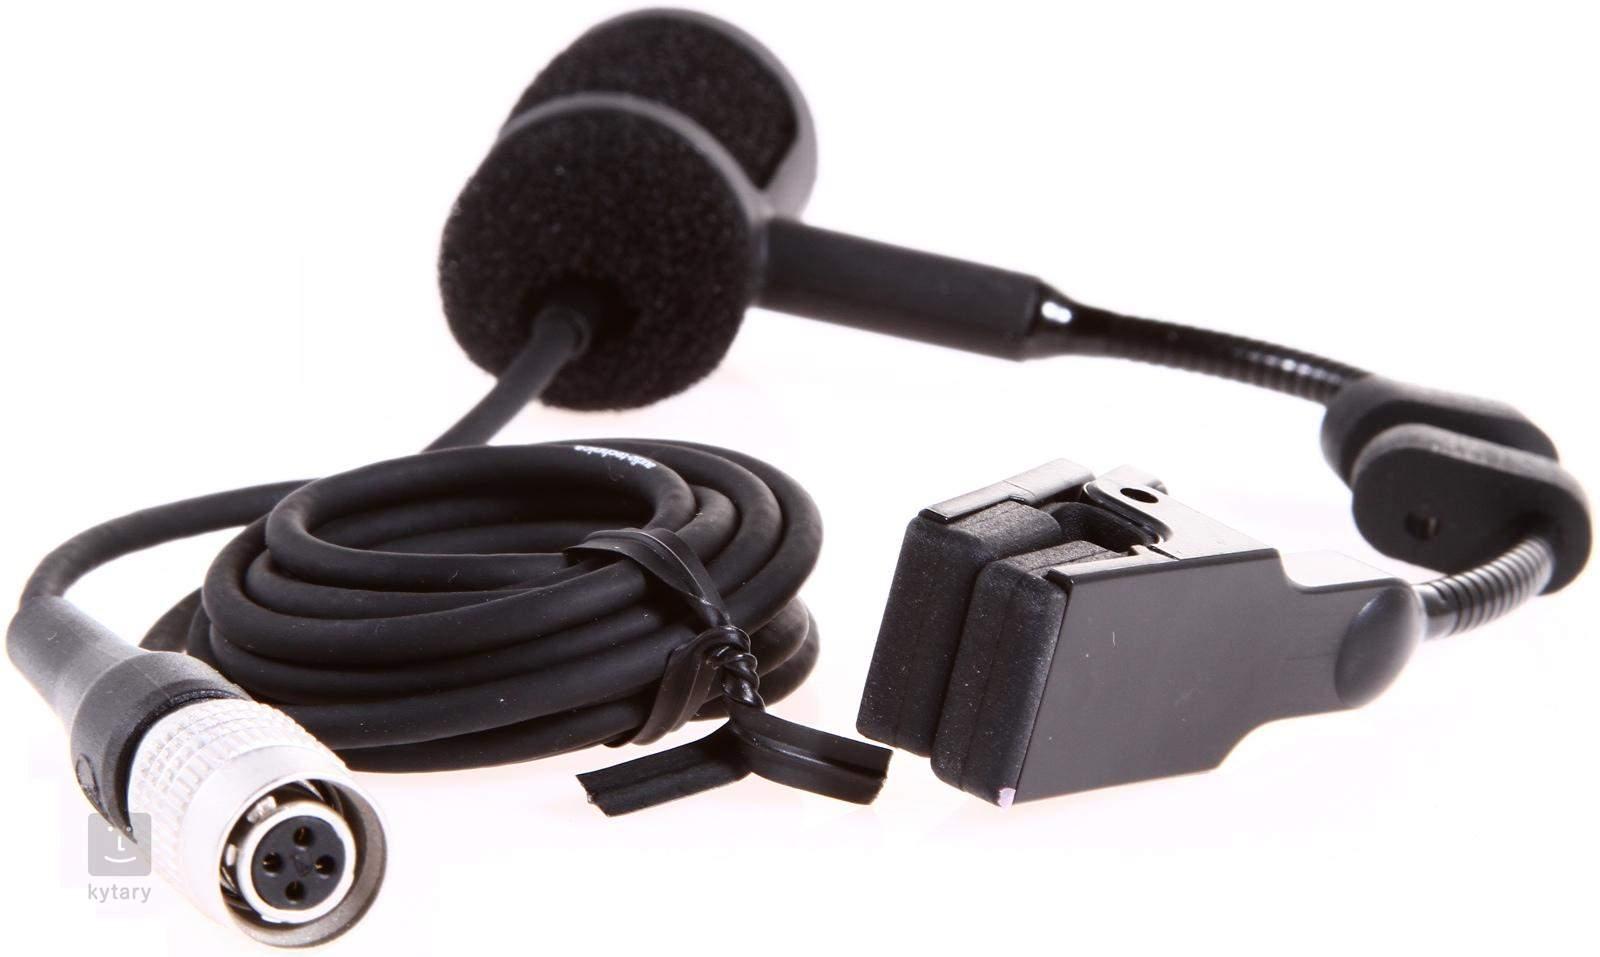 Audio Technica Pro 35CW Microfone com clamp para Percussao e Metais  - Audio Video & cia